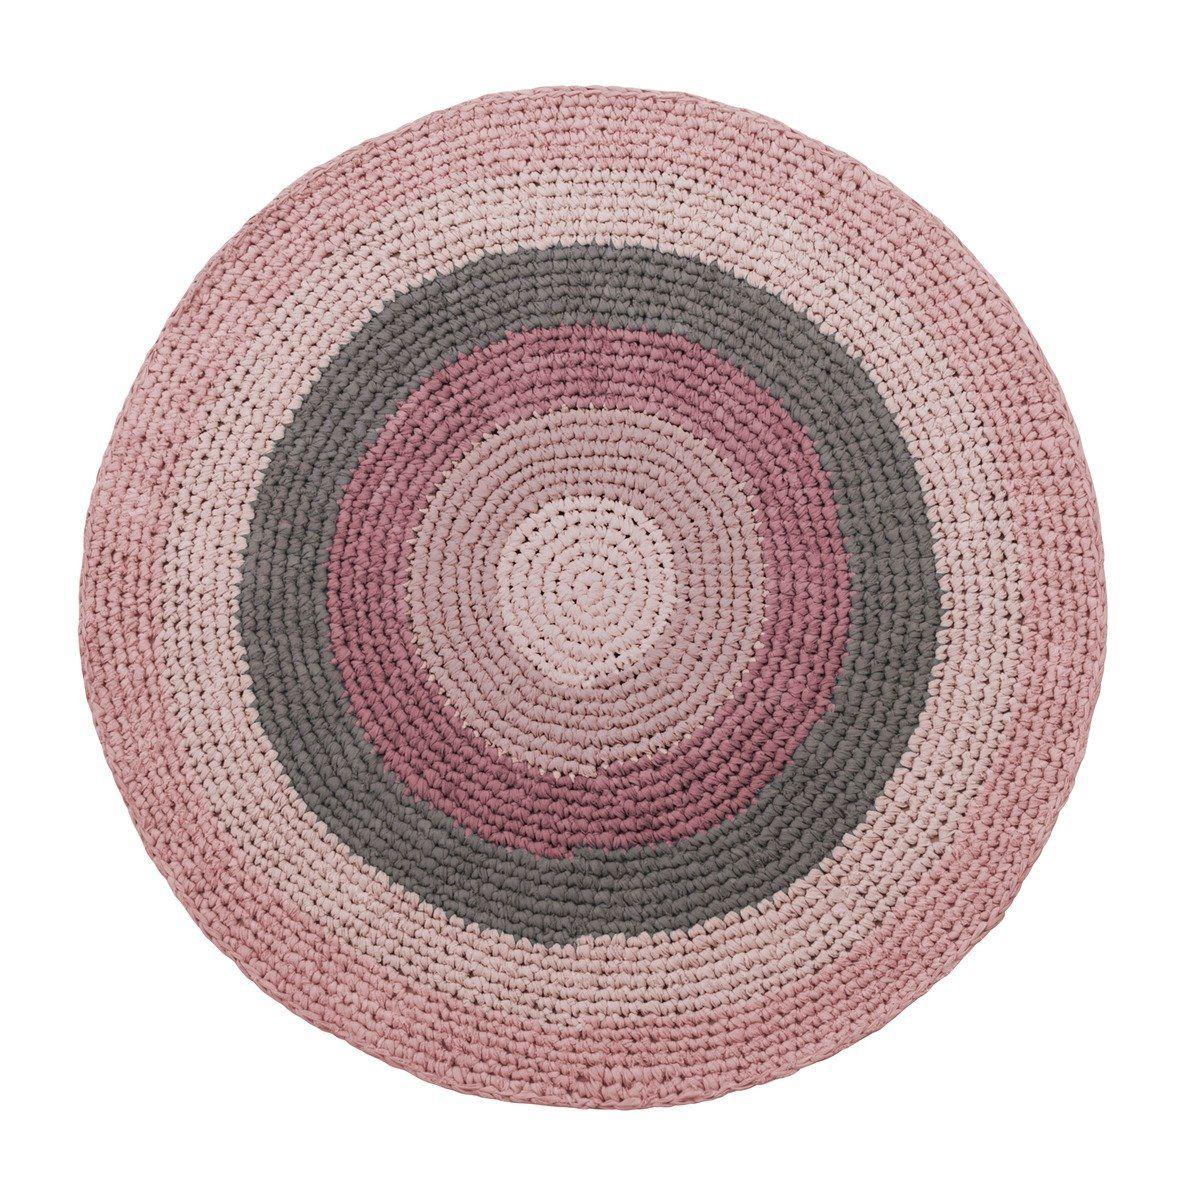 Sebra Teppich Gehäkelt In Grau Und Rosa Teppich Rund Kinderzimmer Teppich Altrosa Teppich Kinderzimmer